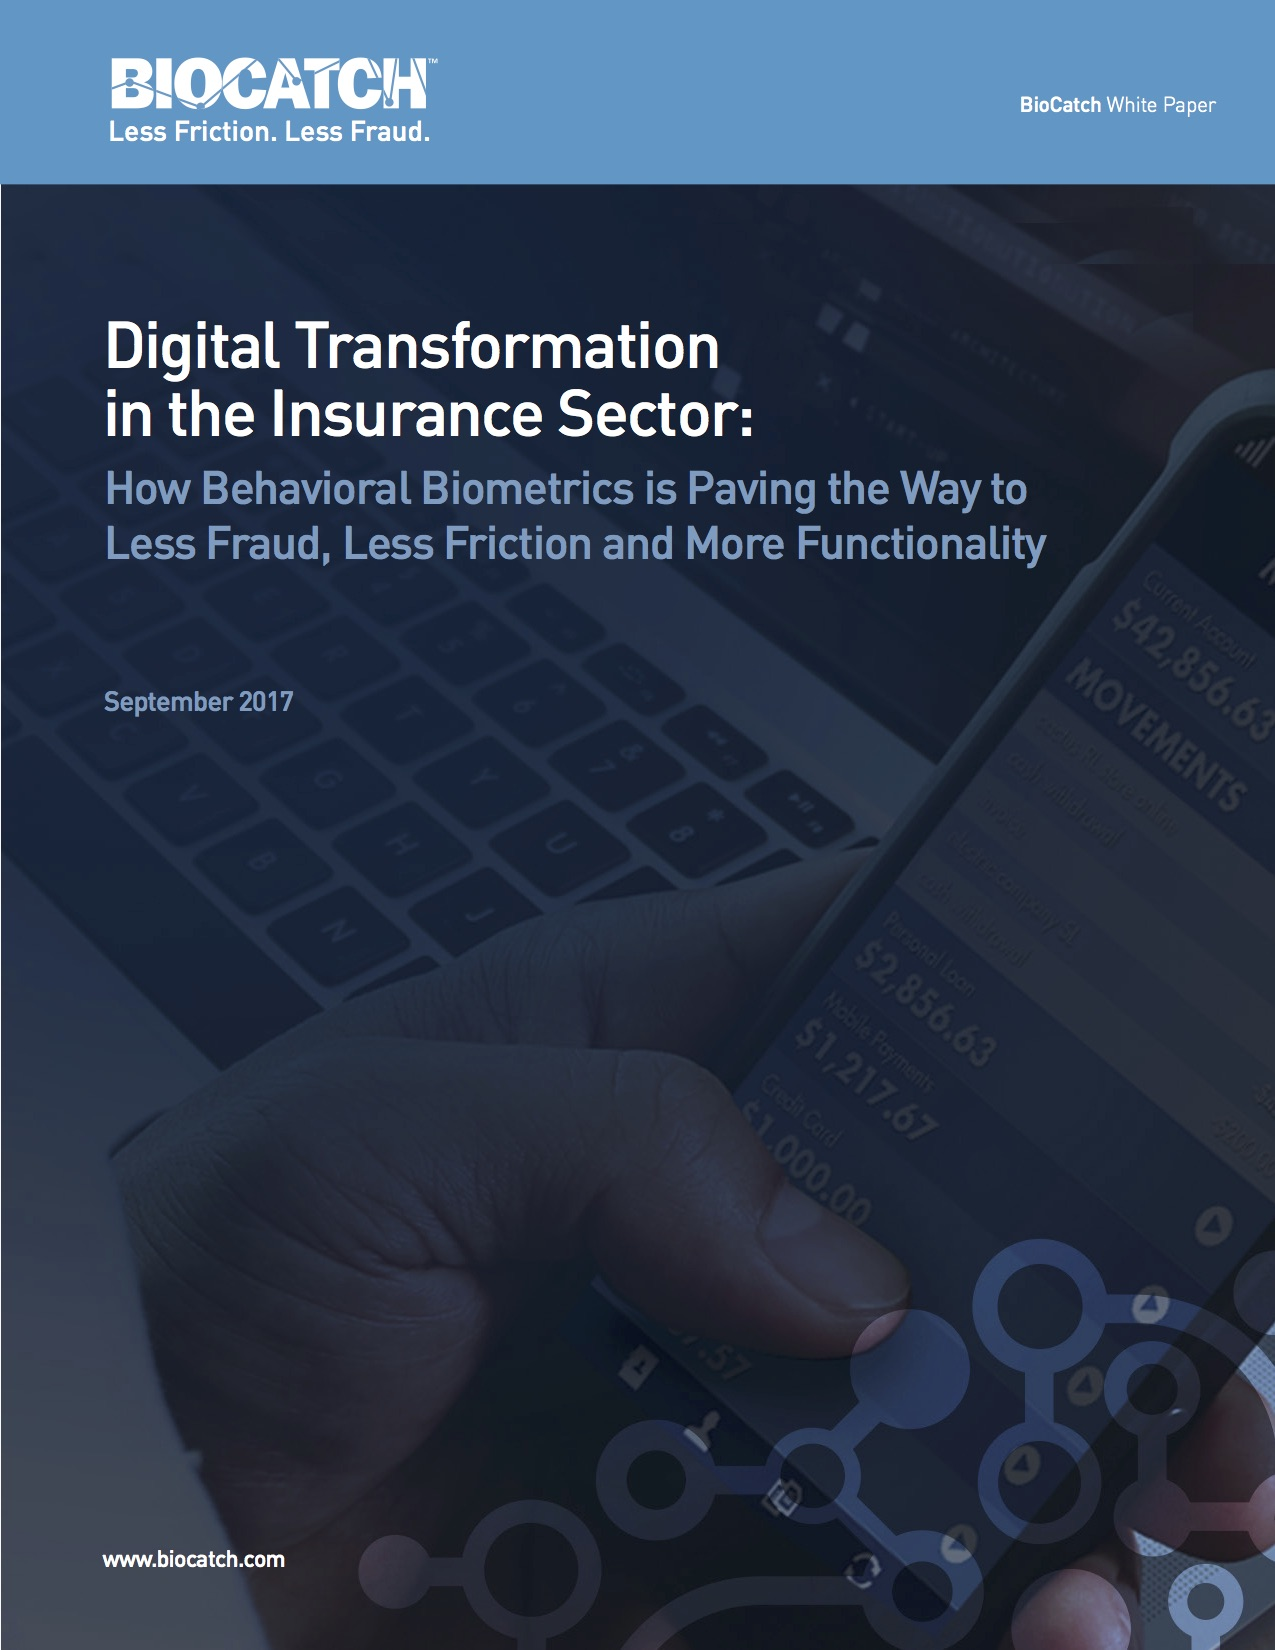 Digital Transformation in the Insurance Sector.jpg